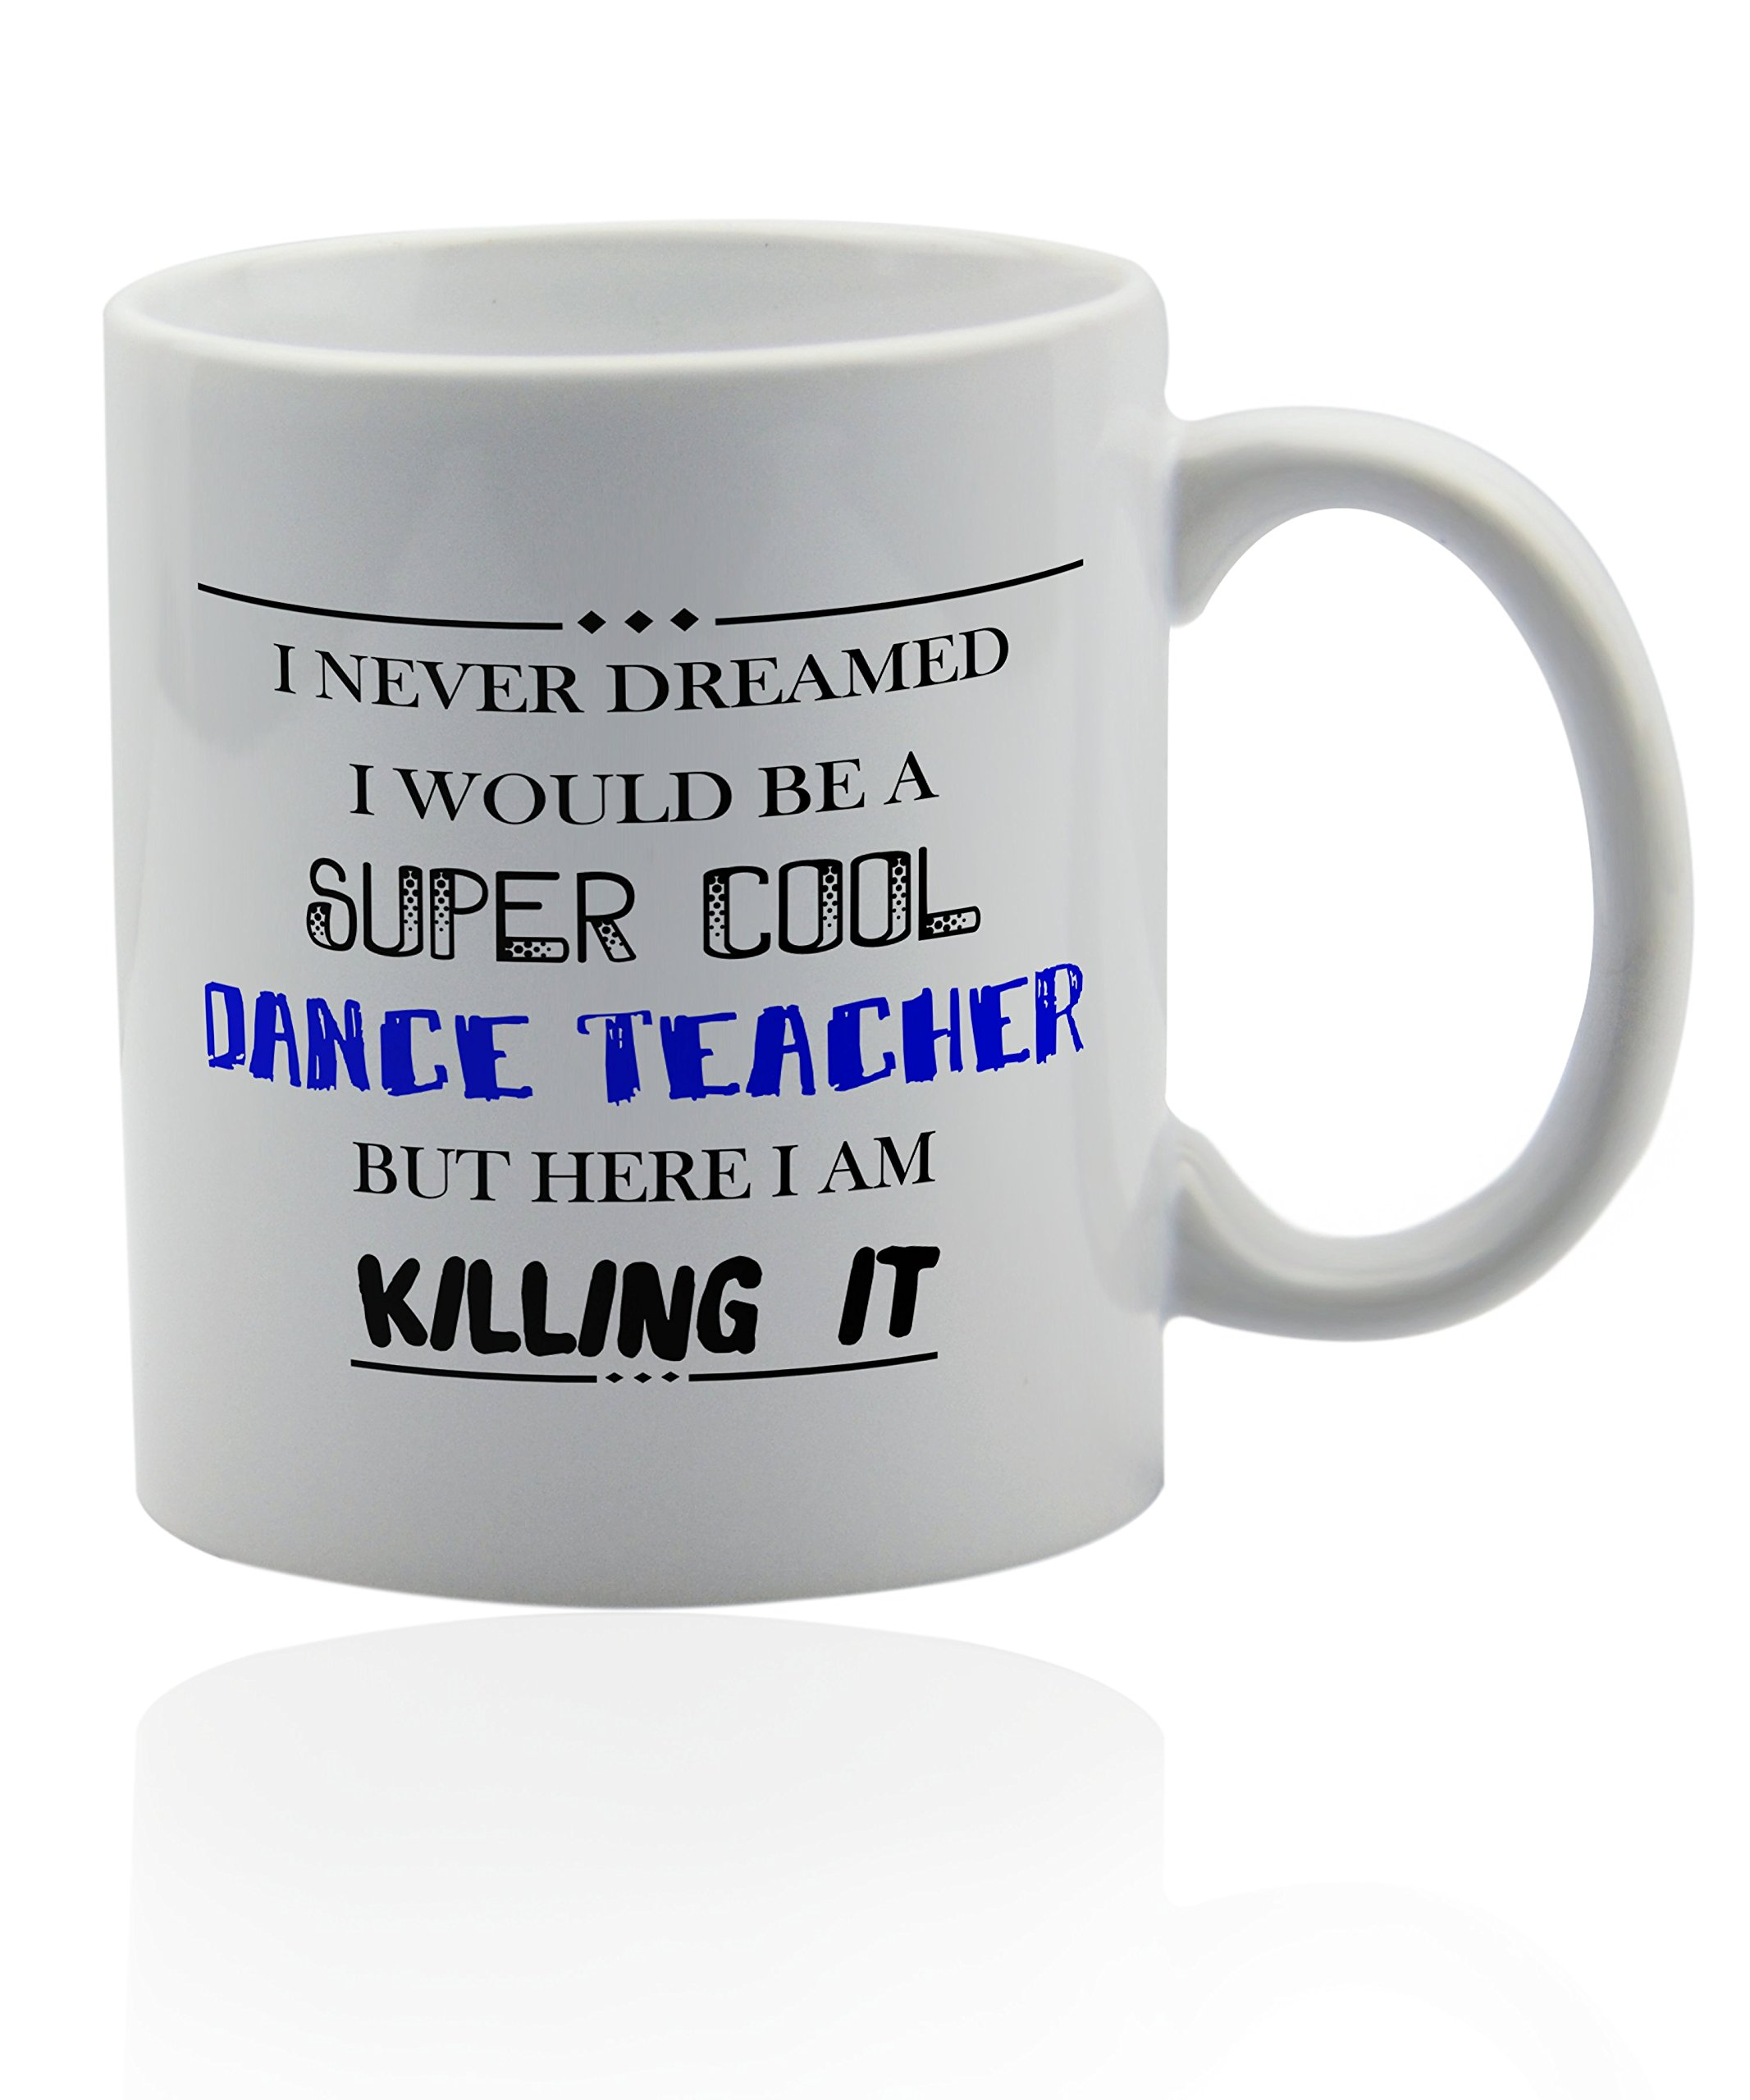 Dance teacher mug for coffee or tea 11 oz. Funny gag joke gift cup. Thank you appreciation gifts.